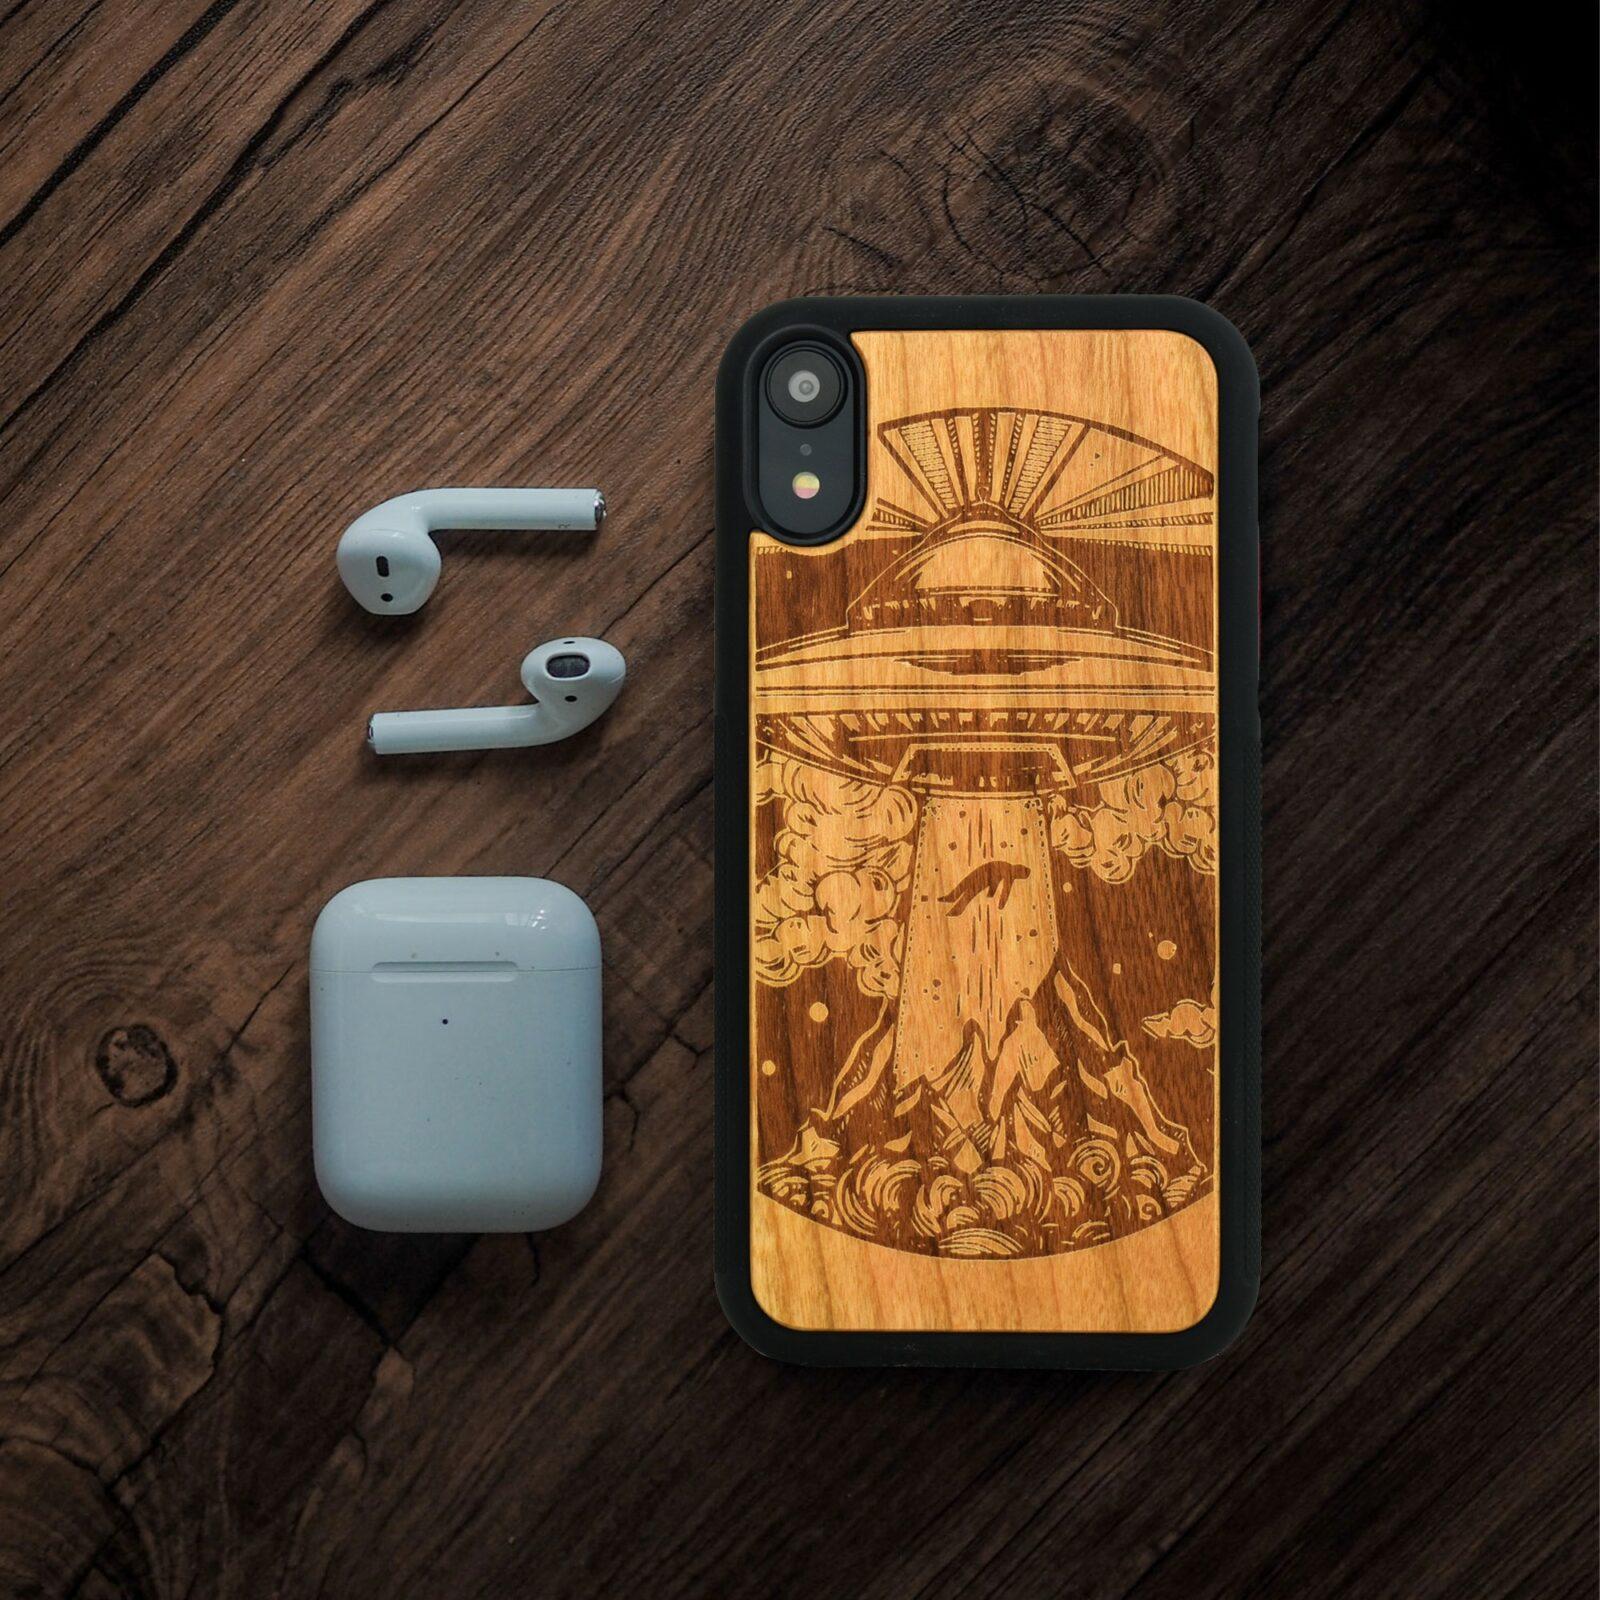 Alien Spaceship Wooden iPhone Case